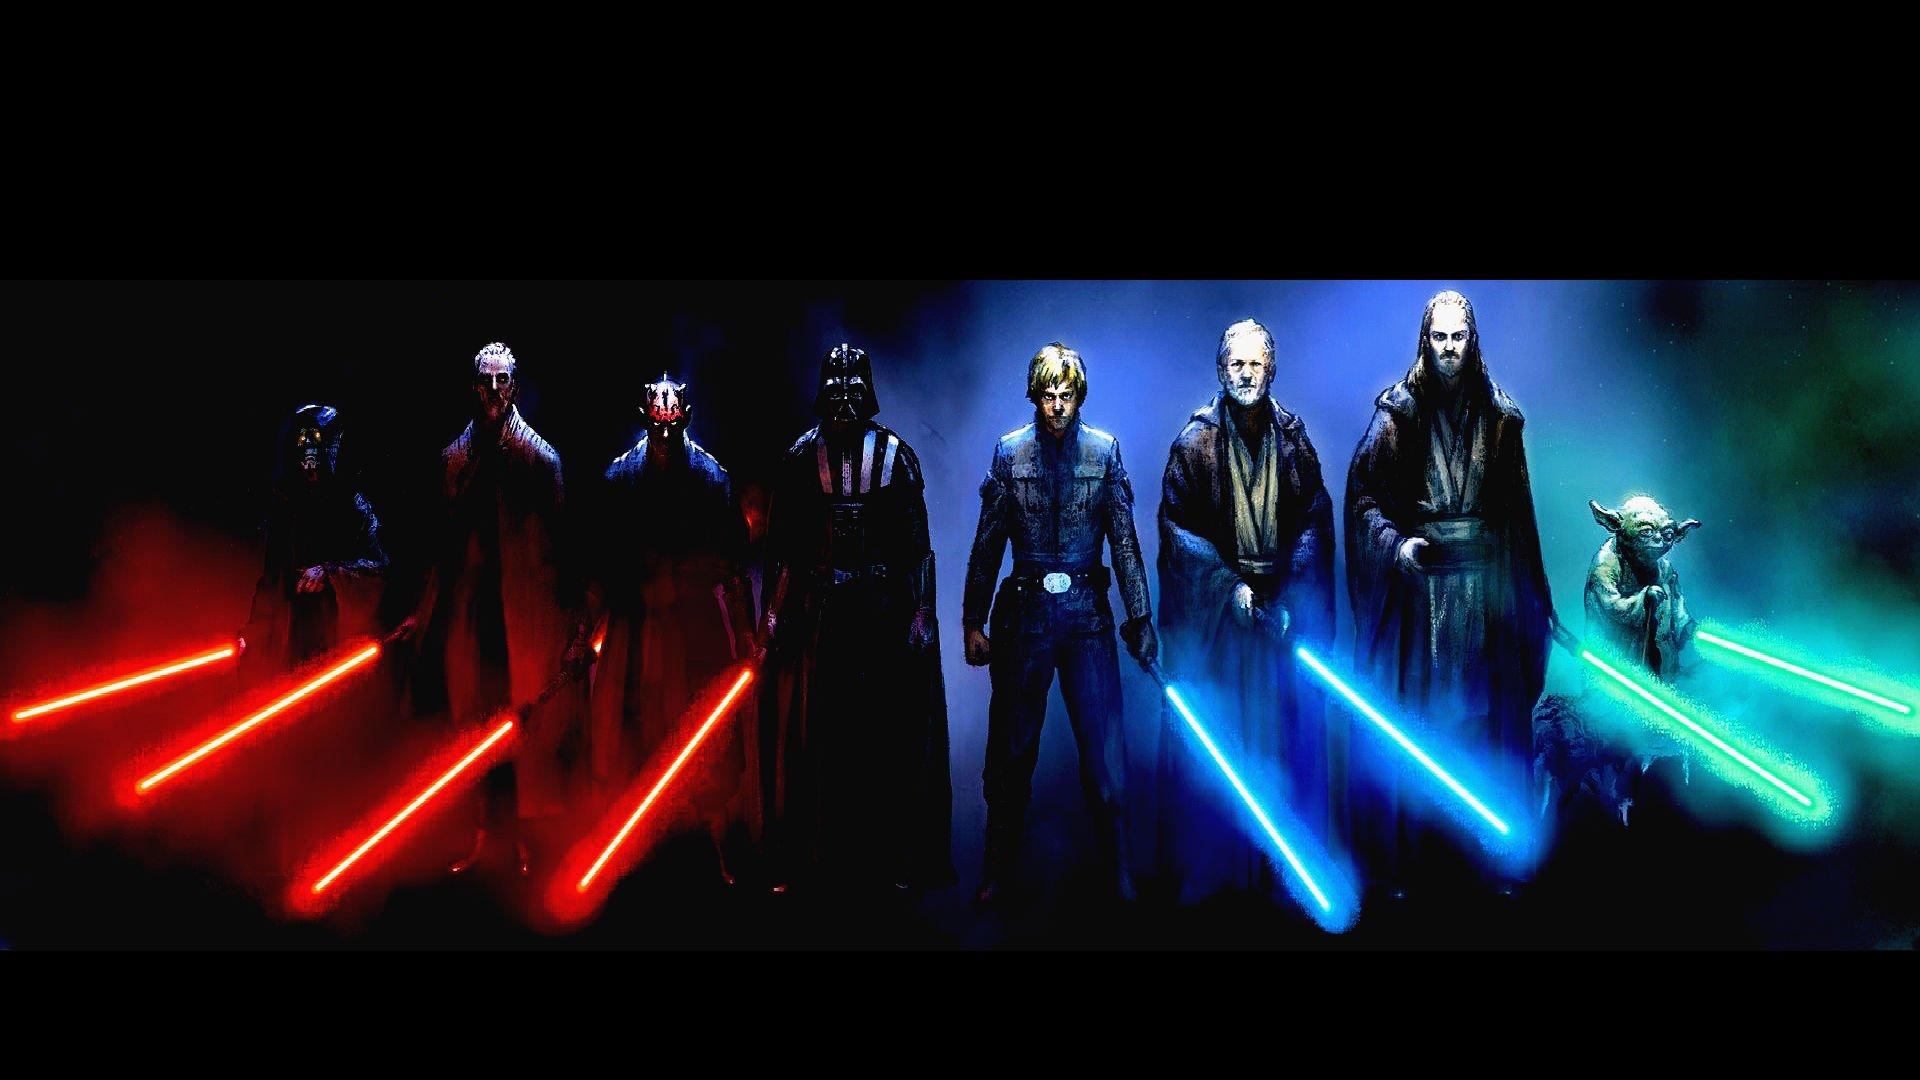 1920x1080px Star Wars The Force Awakens Desktop Wallpaper